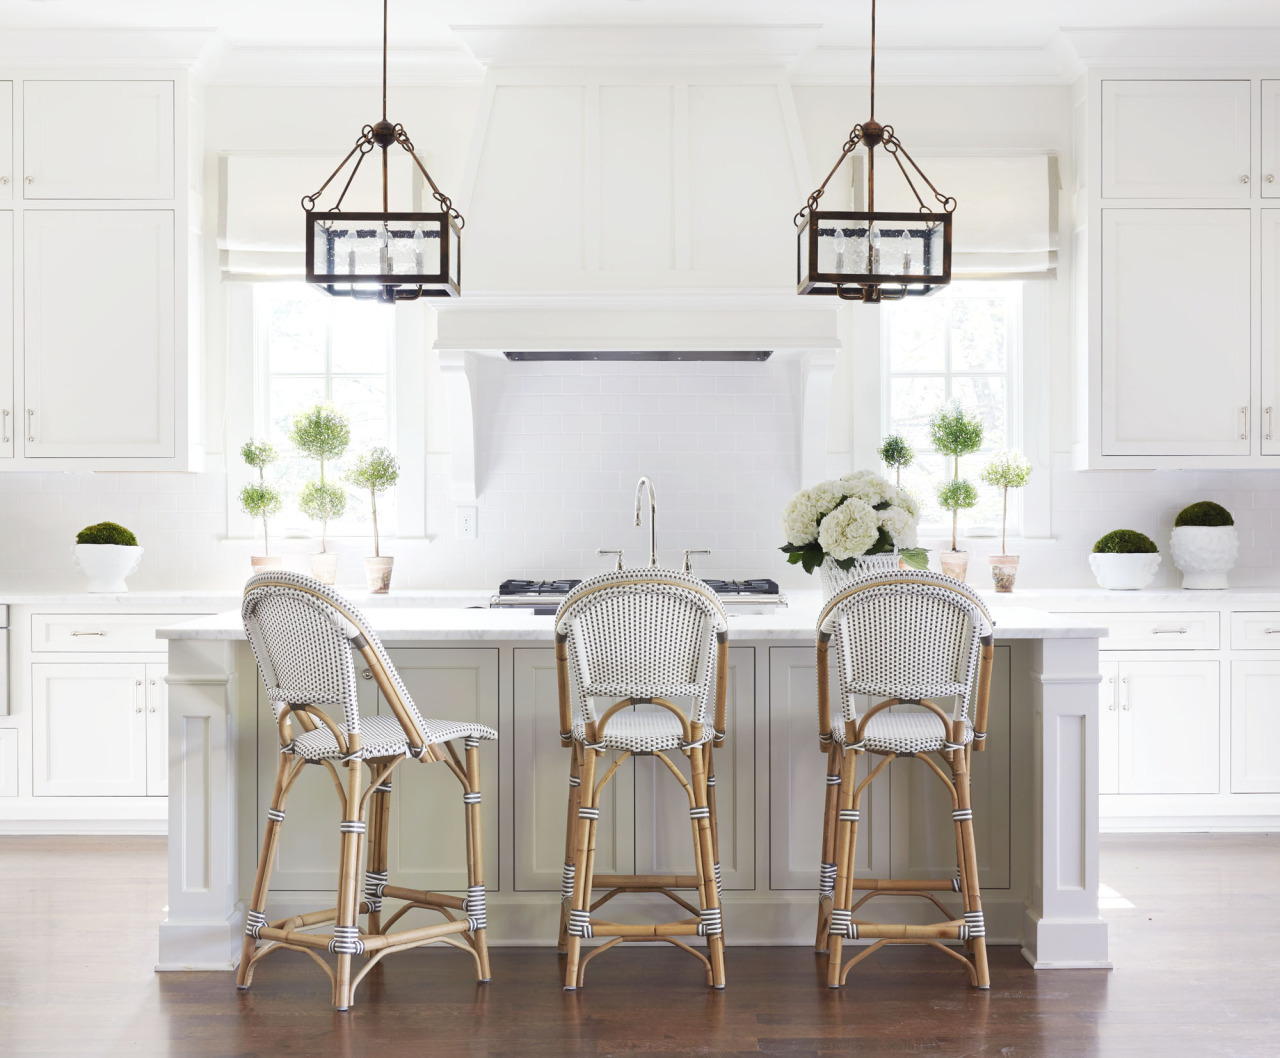 French Bistro Chairs via Sarah Bartholomew Design